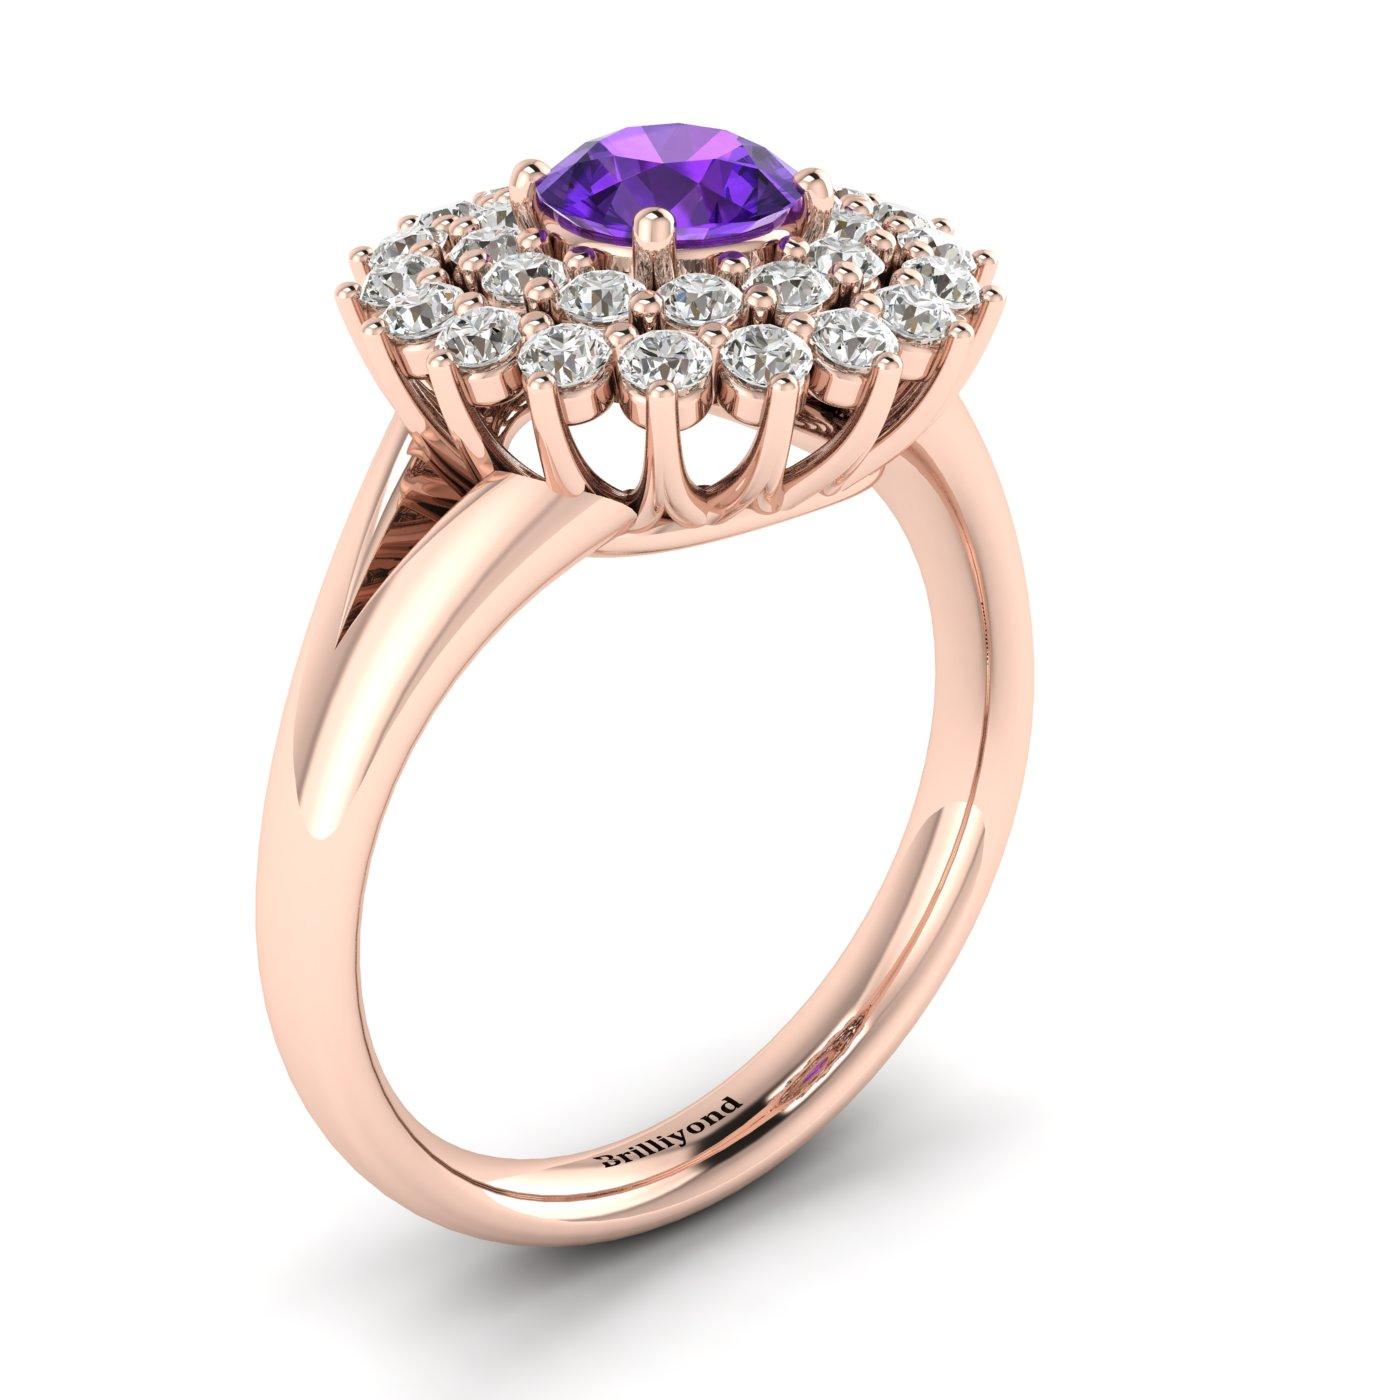 Amethyst Rose Gold Cluster Engagement Ring Aquila_image2